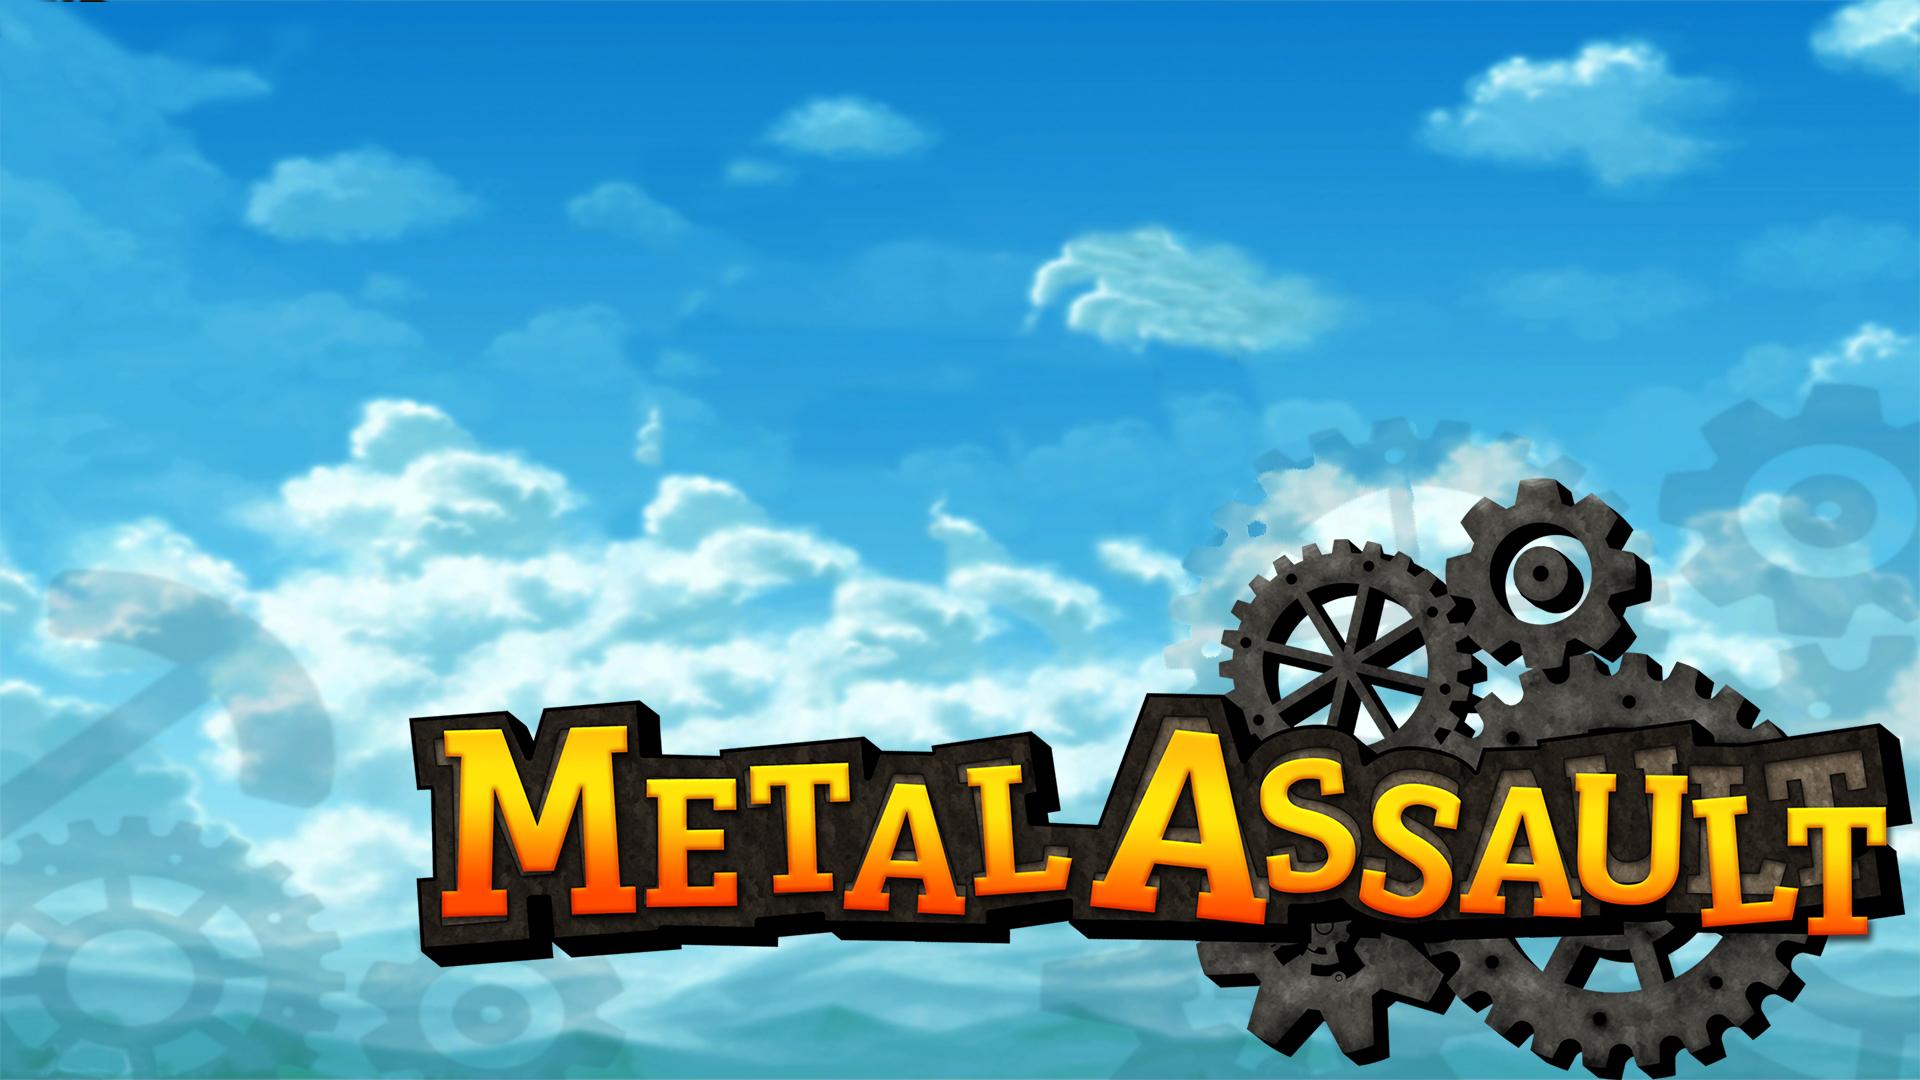 Metal_Assault_Sky.jpg